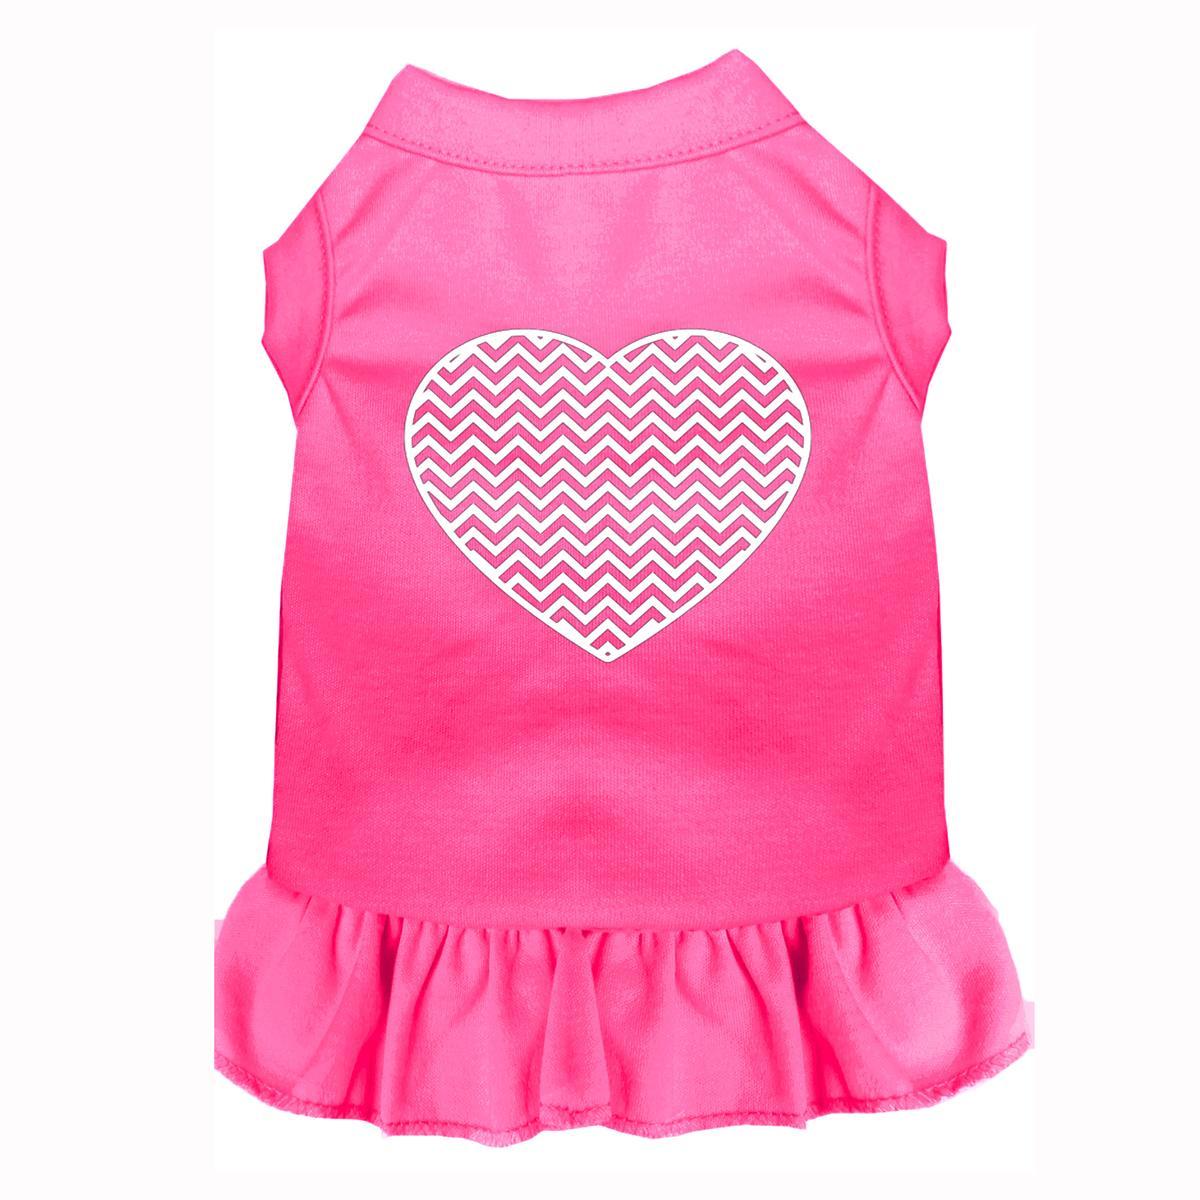 Chevron Heart Screen Print Dog Dress - Bright Pink